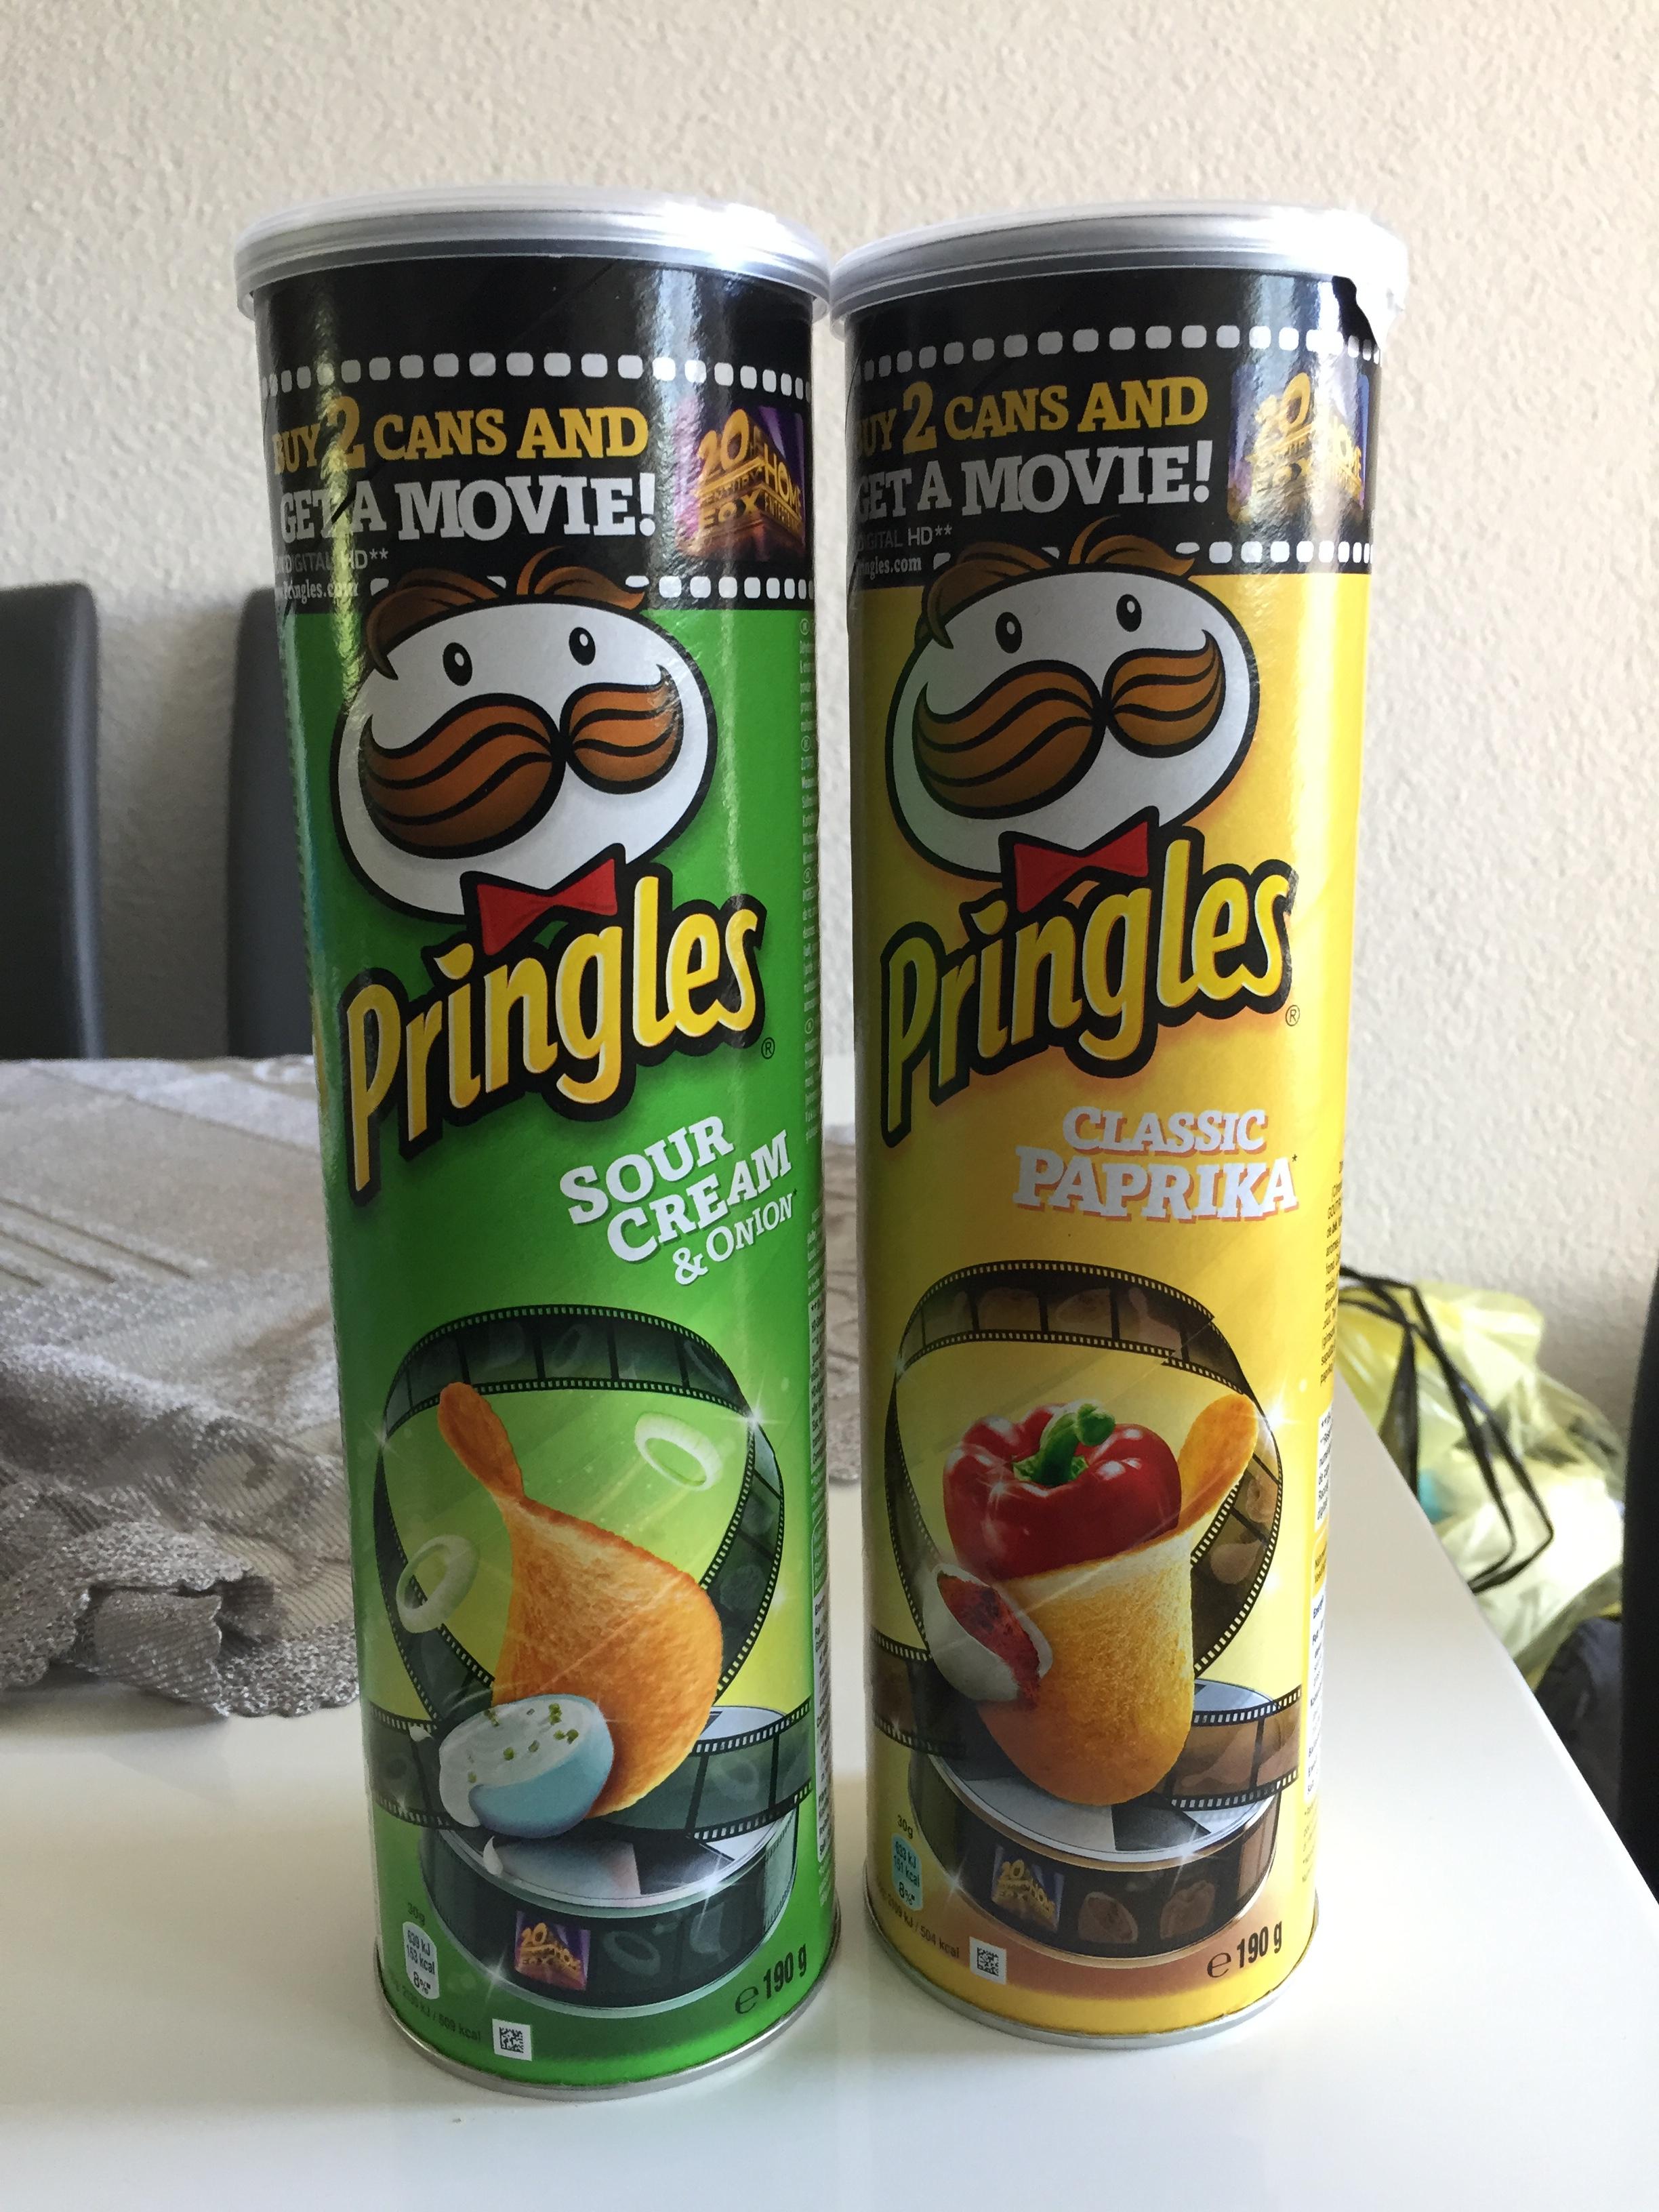 Pringles Paprika im Kaufland(Pforzheim)evtl. bundesweit